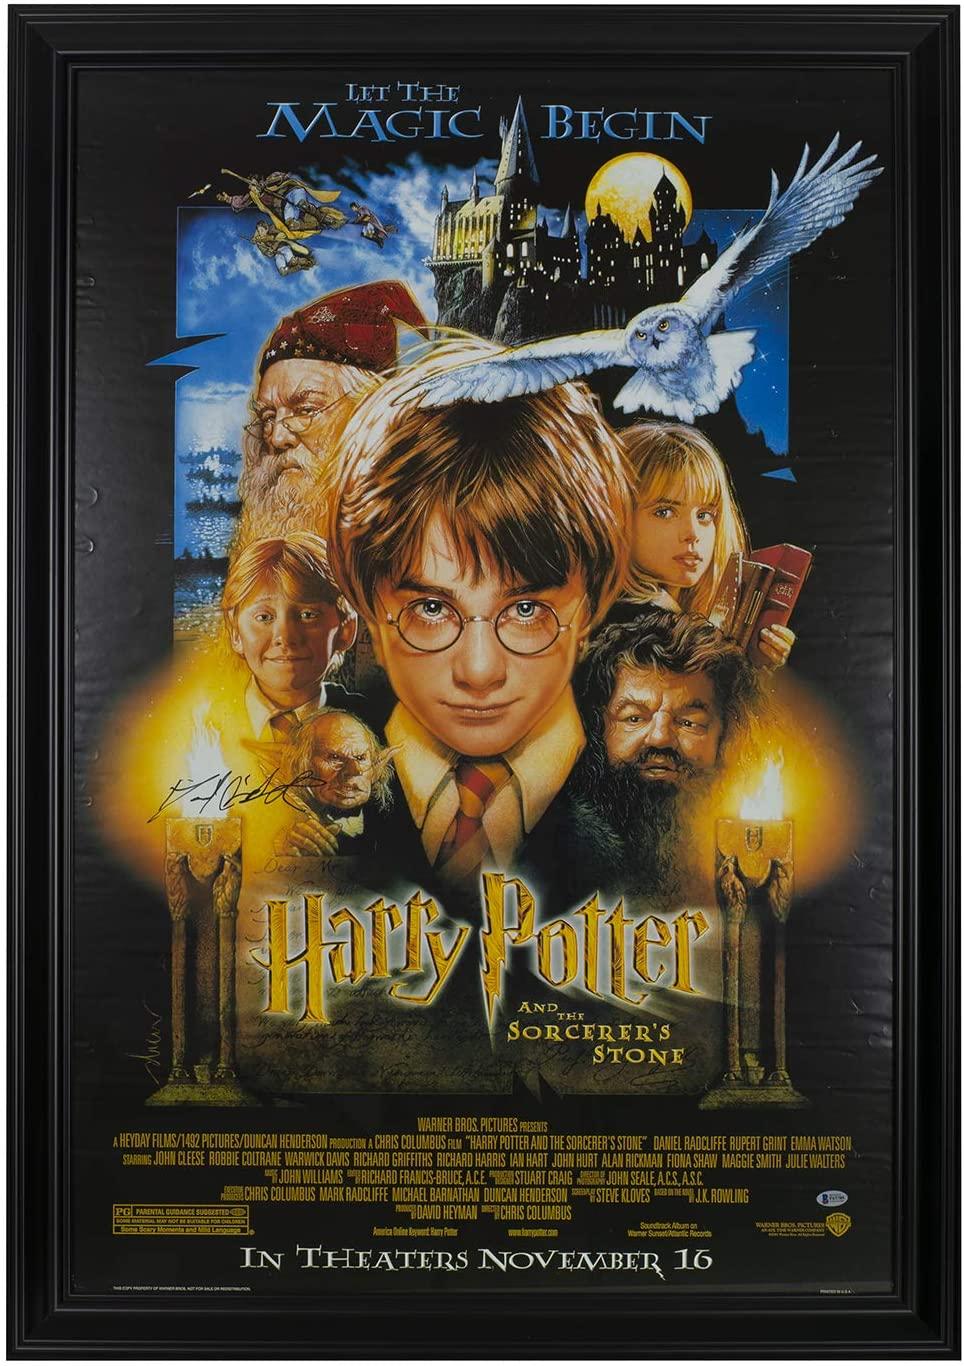 Daniel Radcliffe Signed Framed Harry Potter Sorcerers Stone Movie Poster BAS